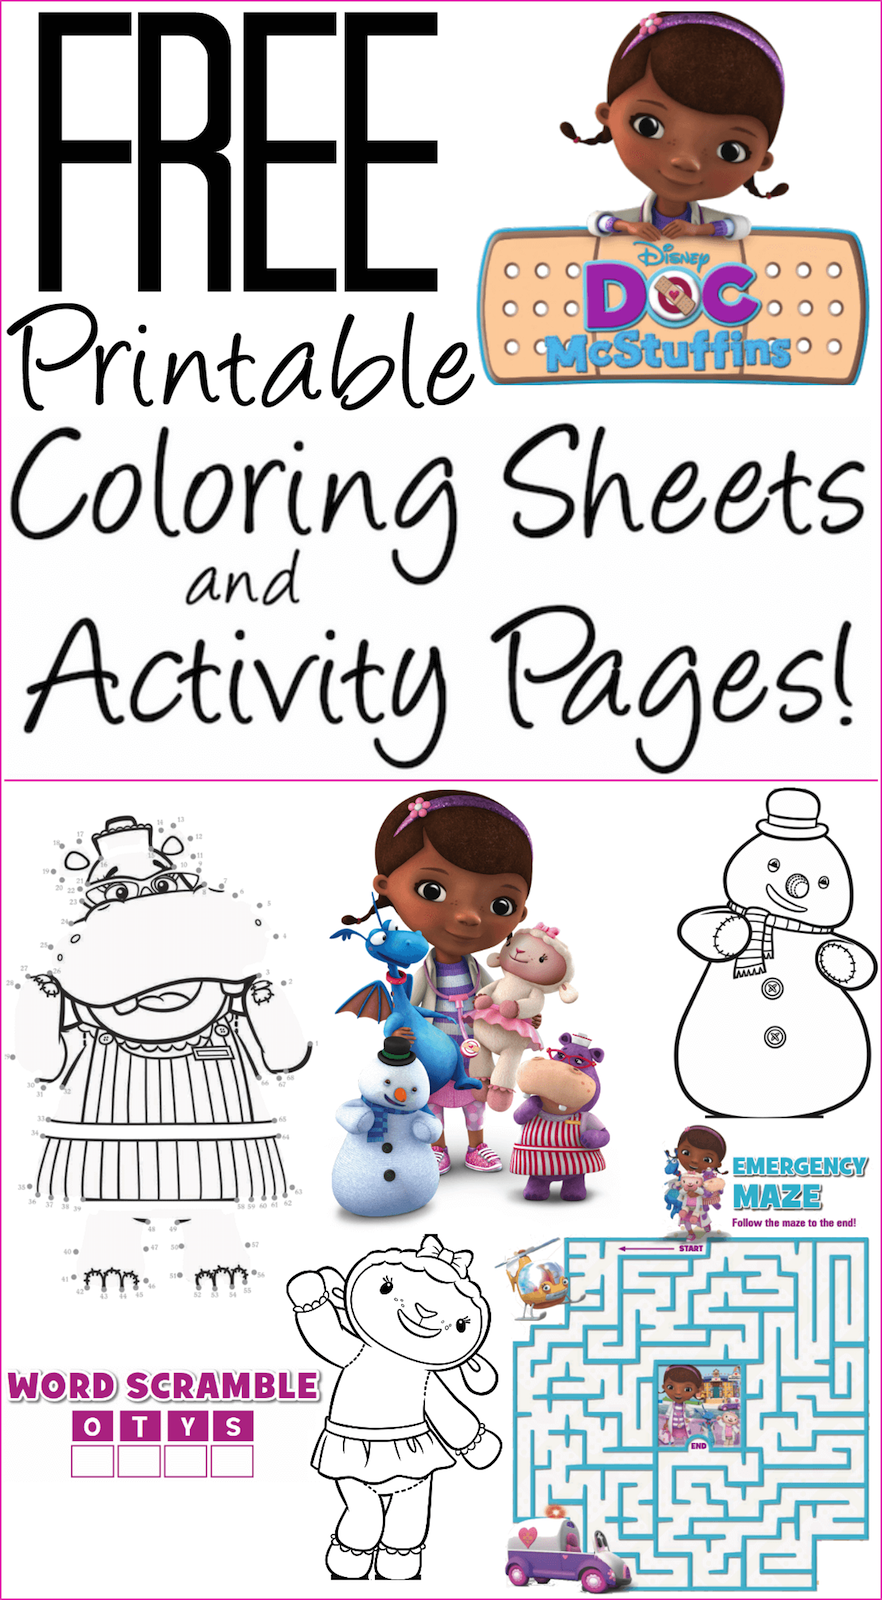 Free Printable Doc Mcstuffins Coloring Pages Activity